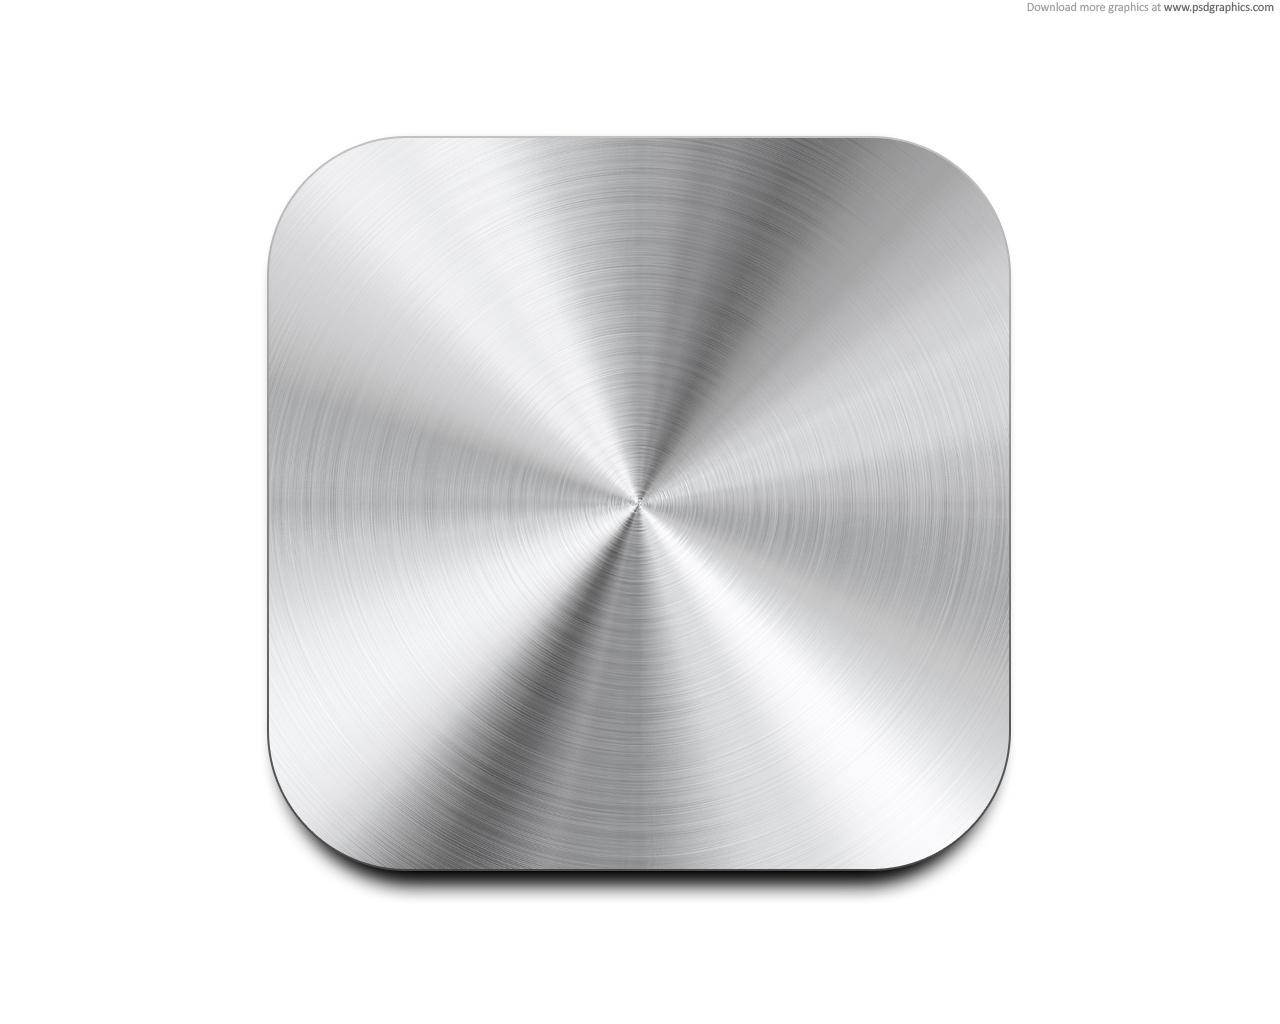 http://www.newdesignfile.com/postpic/2010/09/metal-button-icon_334754.jpg 3d